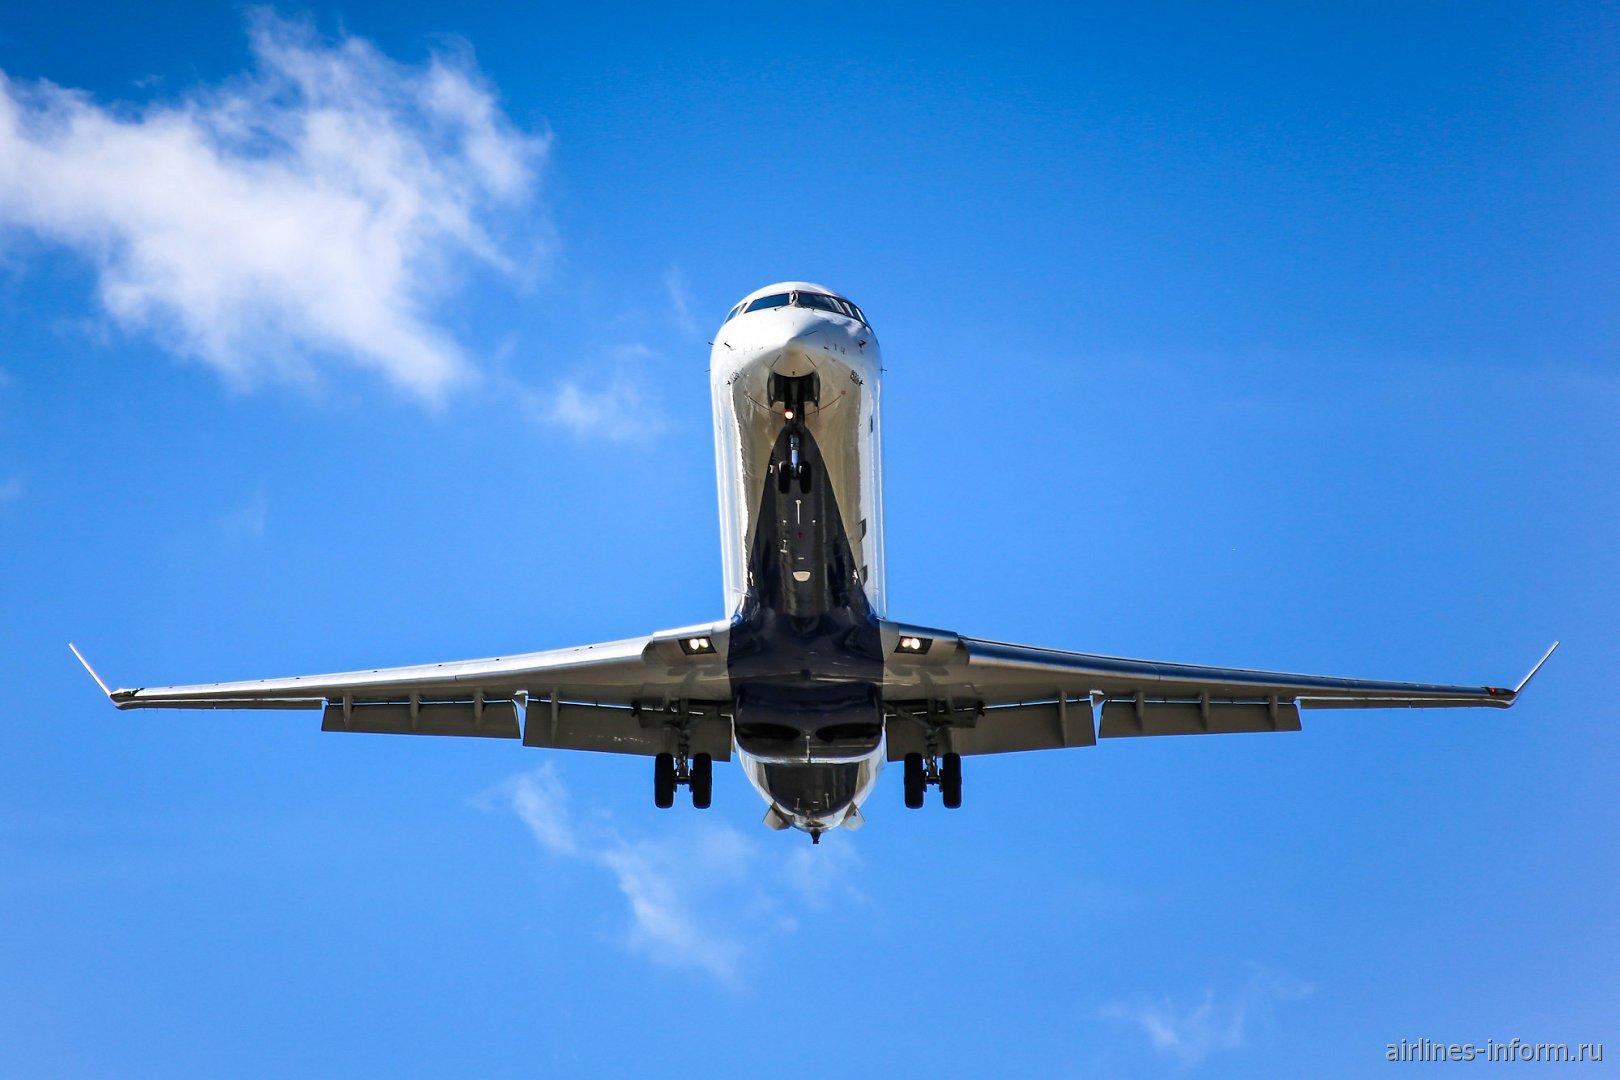 Самолет Bombardier CRJ700